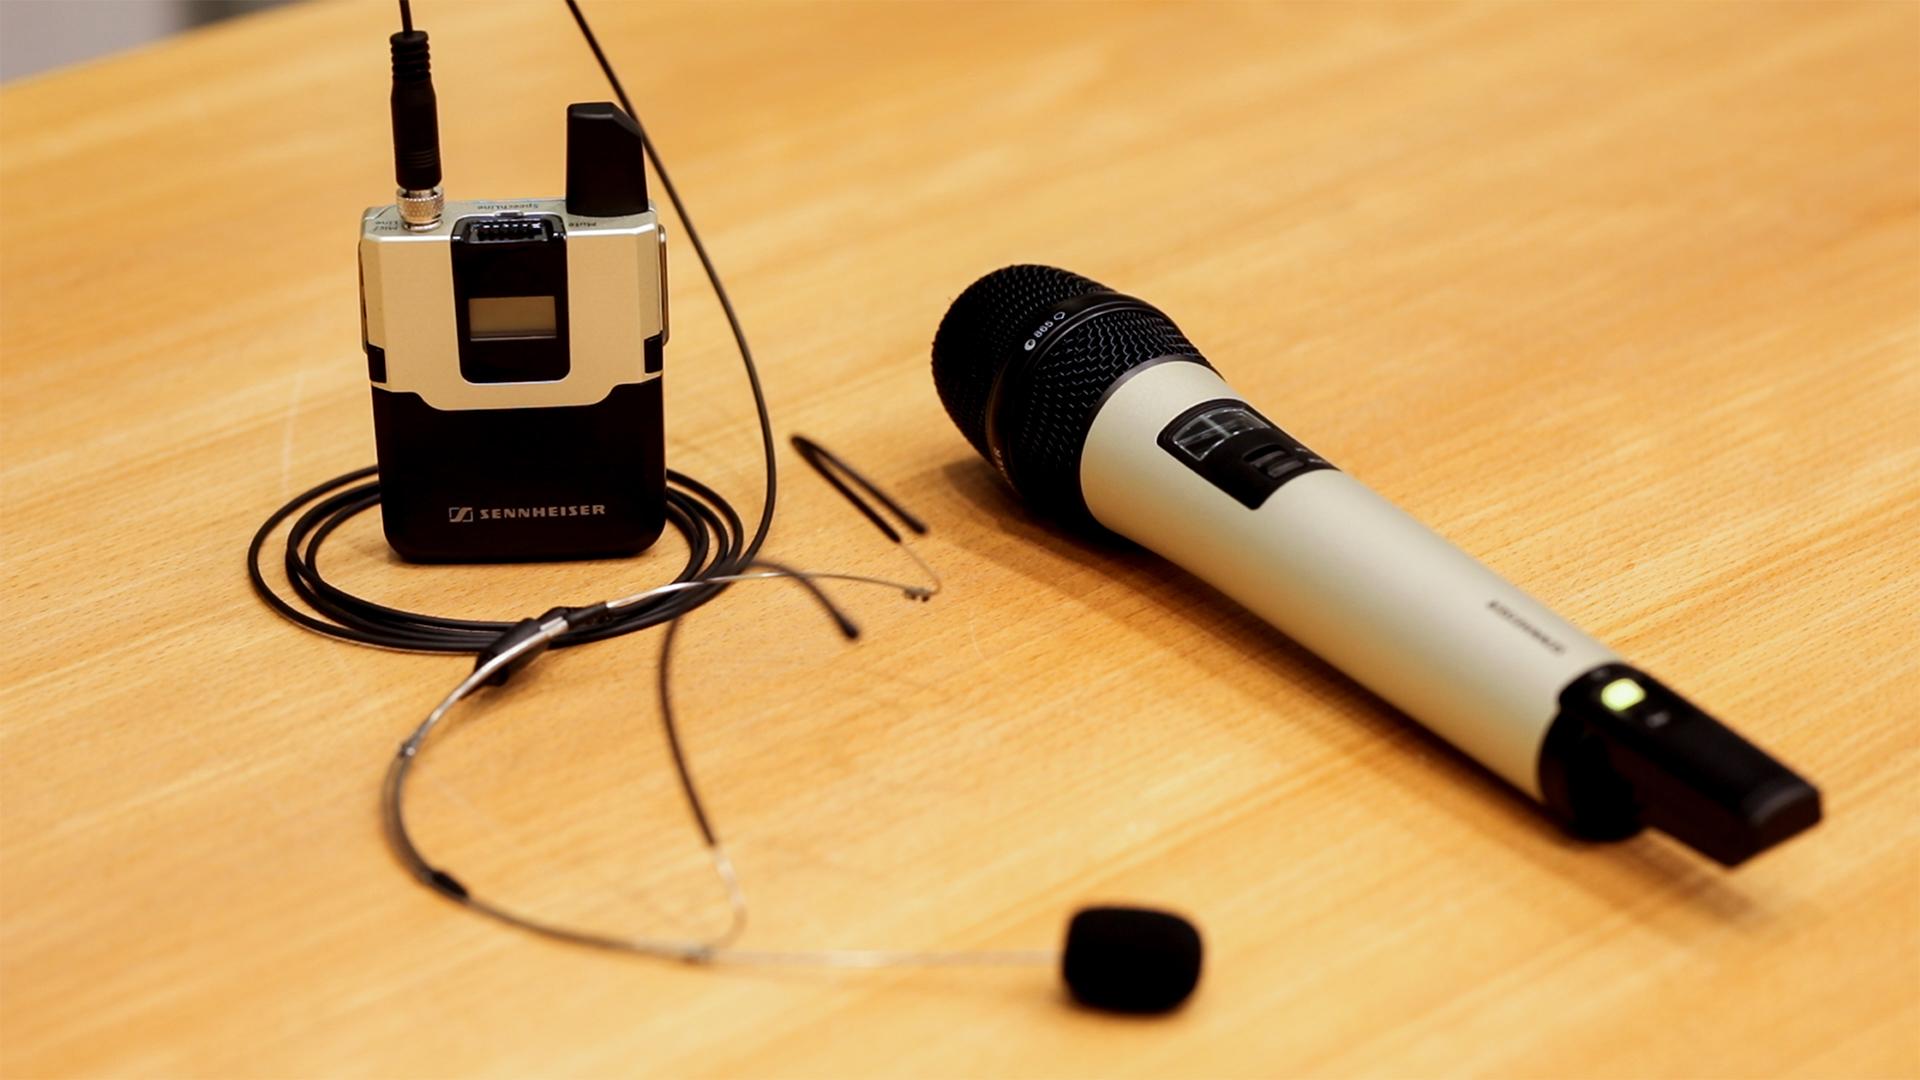 Sennheiser Mikrofone im Hörsaal in Max-Planck Institut für Biogeochemie in Jena